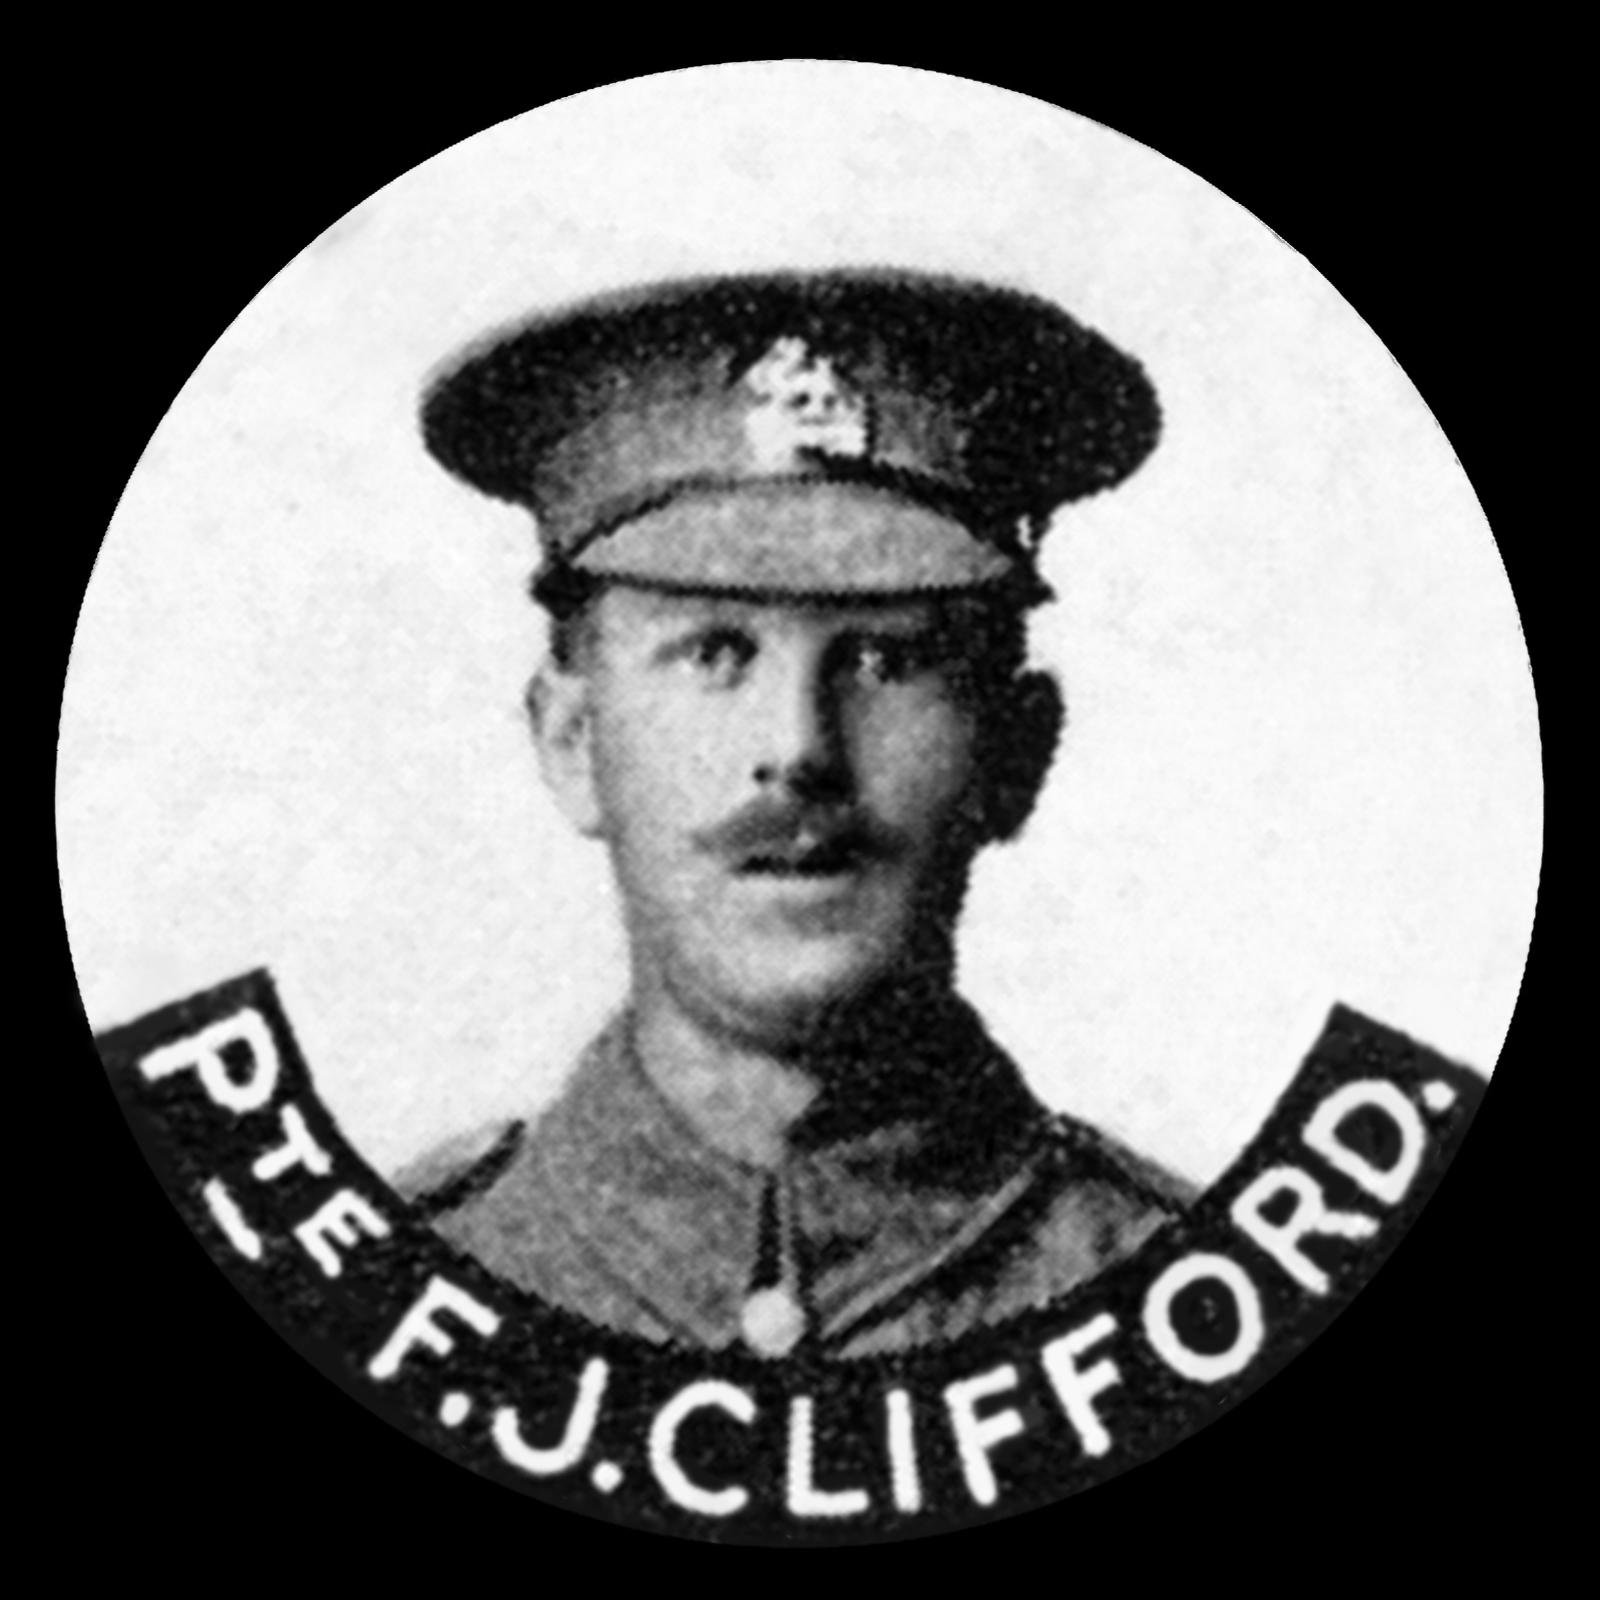 CLIFFORD Frank John